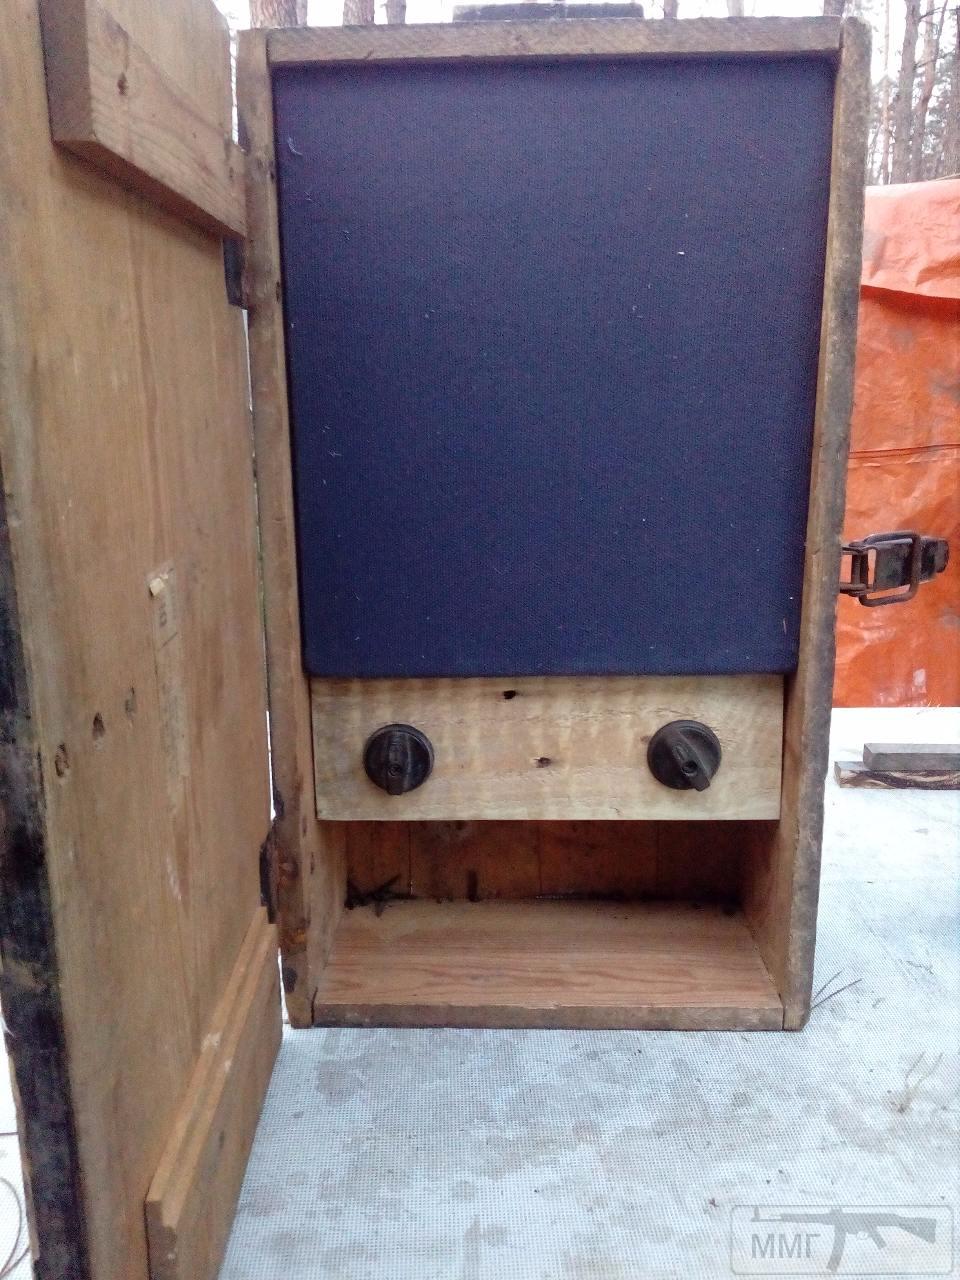 16832 - Полевое радио.